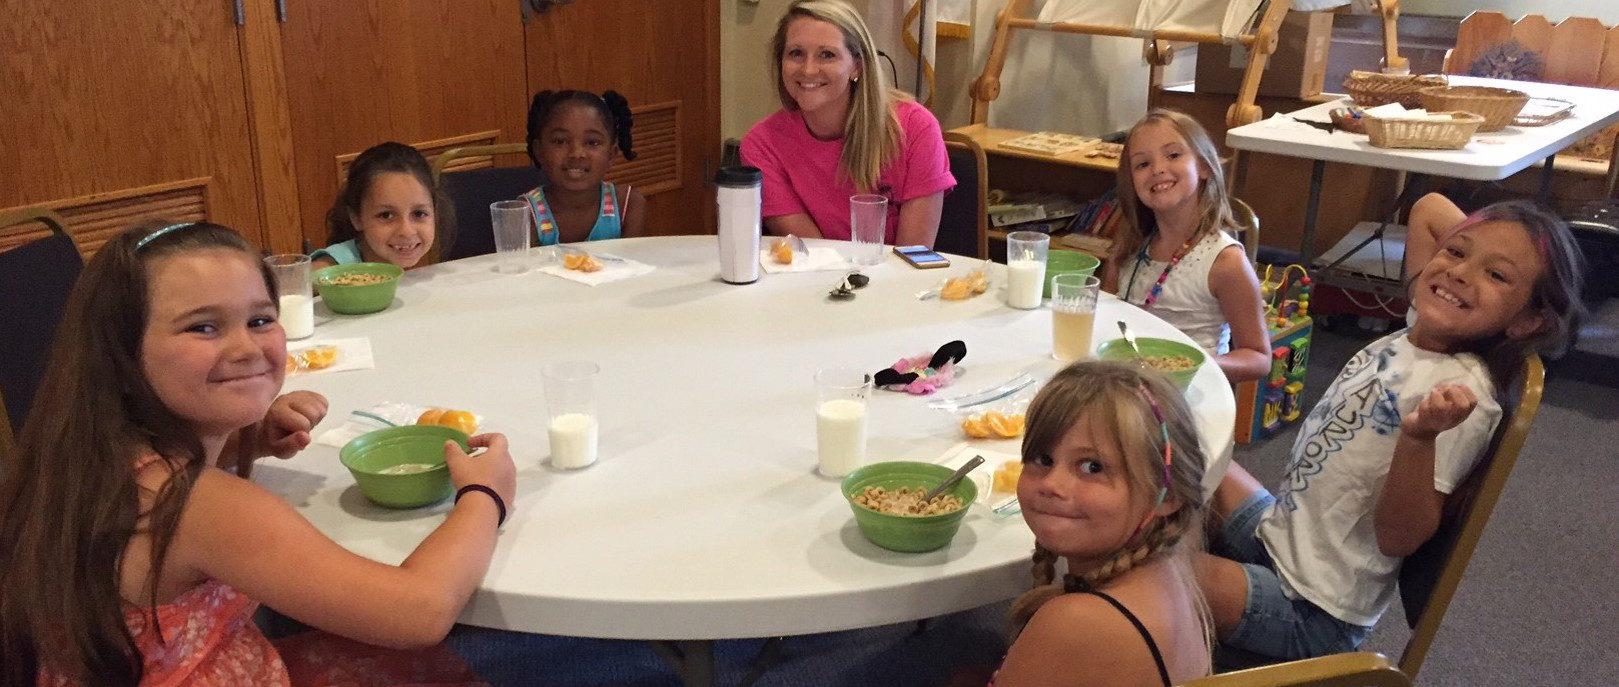 Breakfast at Summer Program for Youth